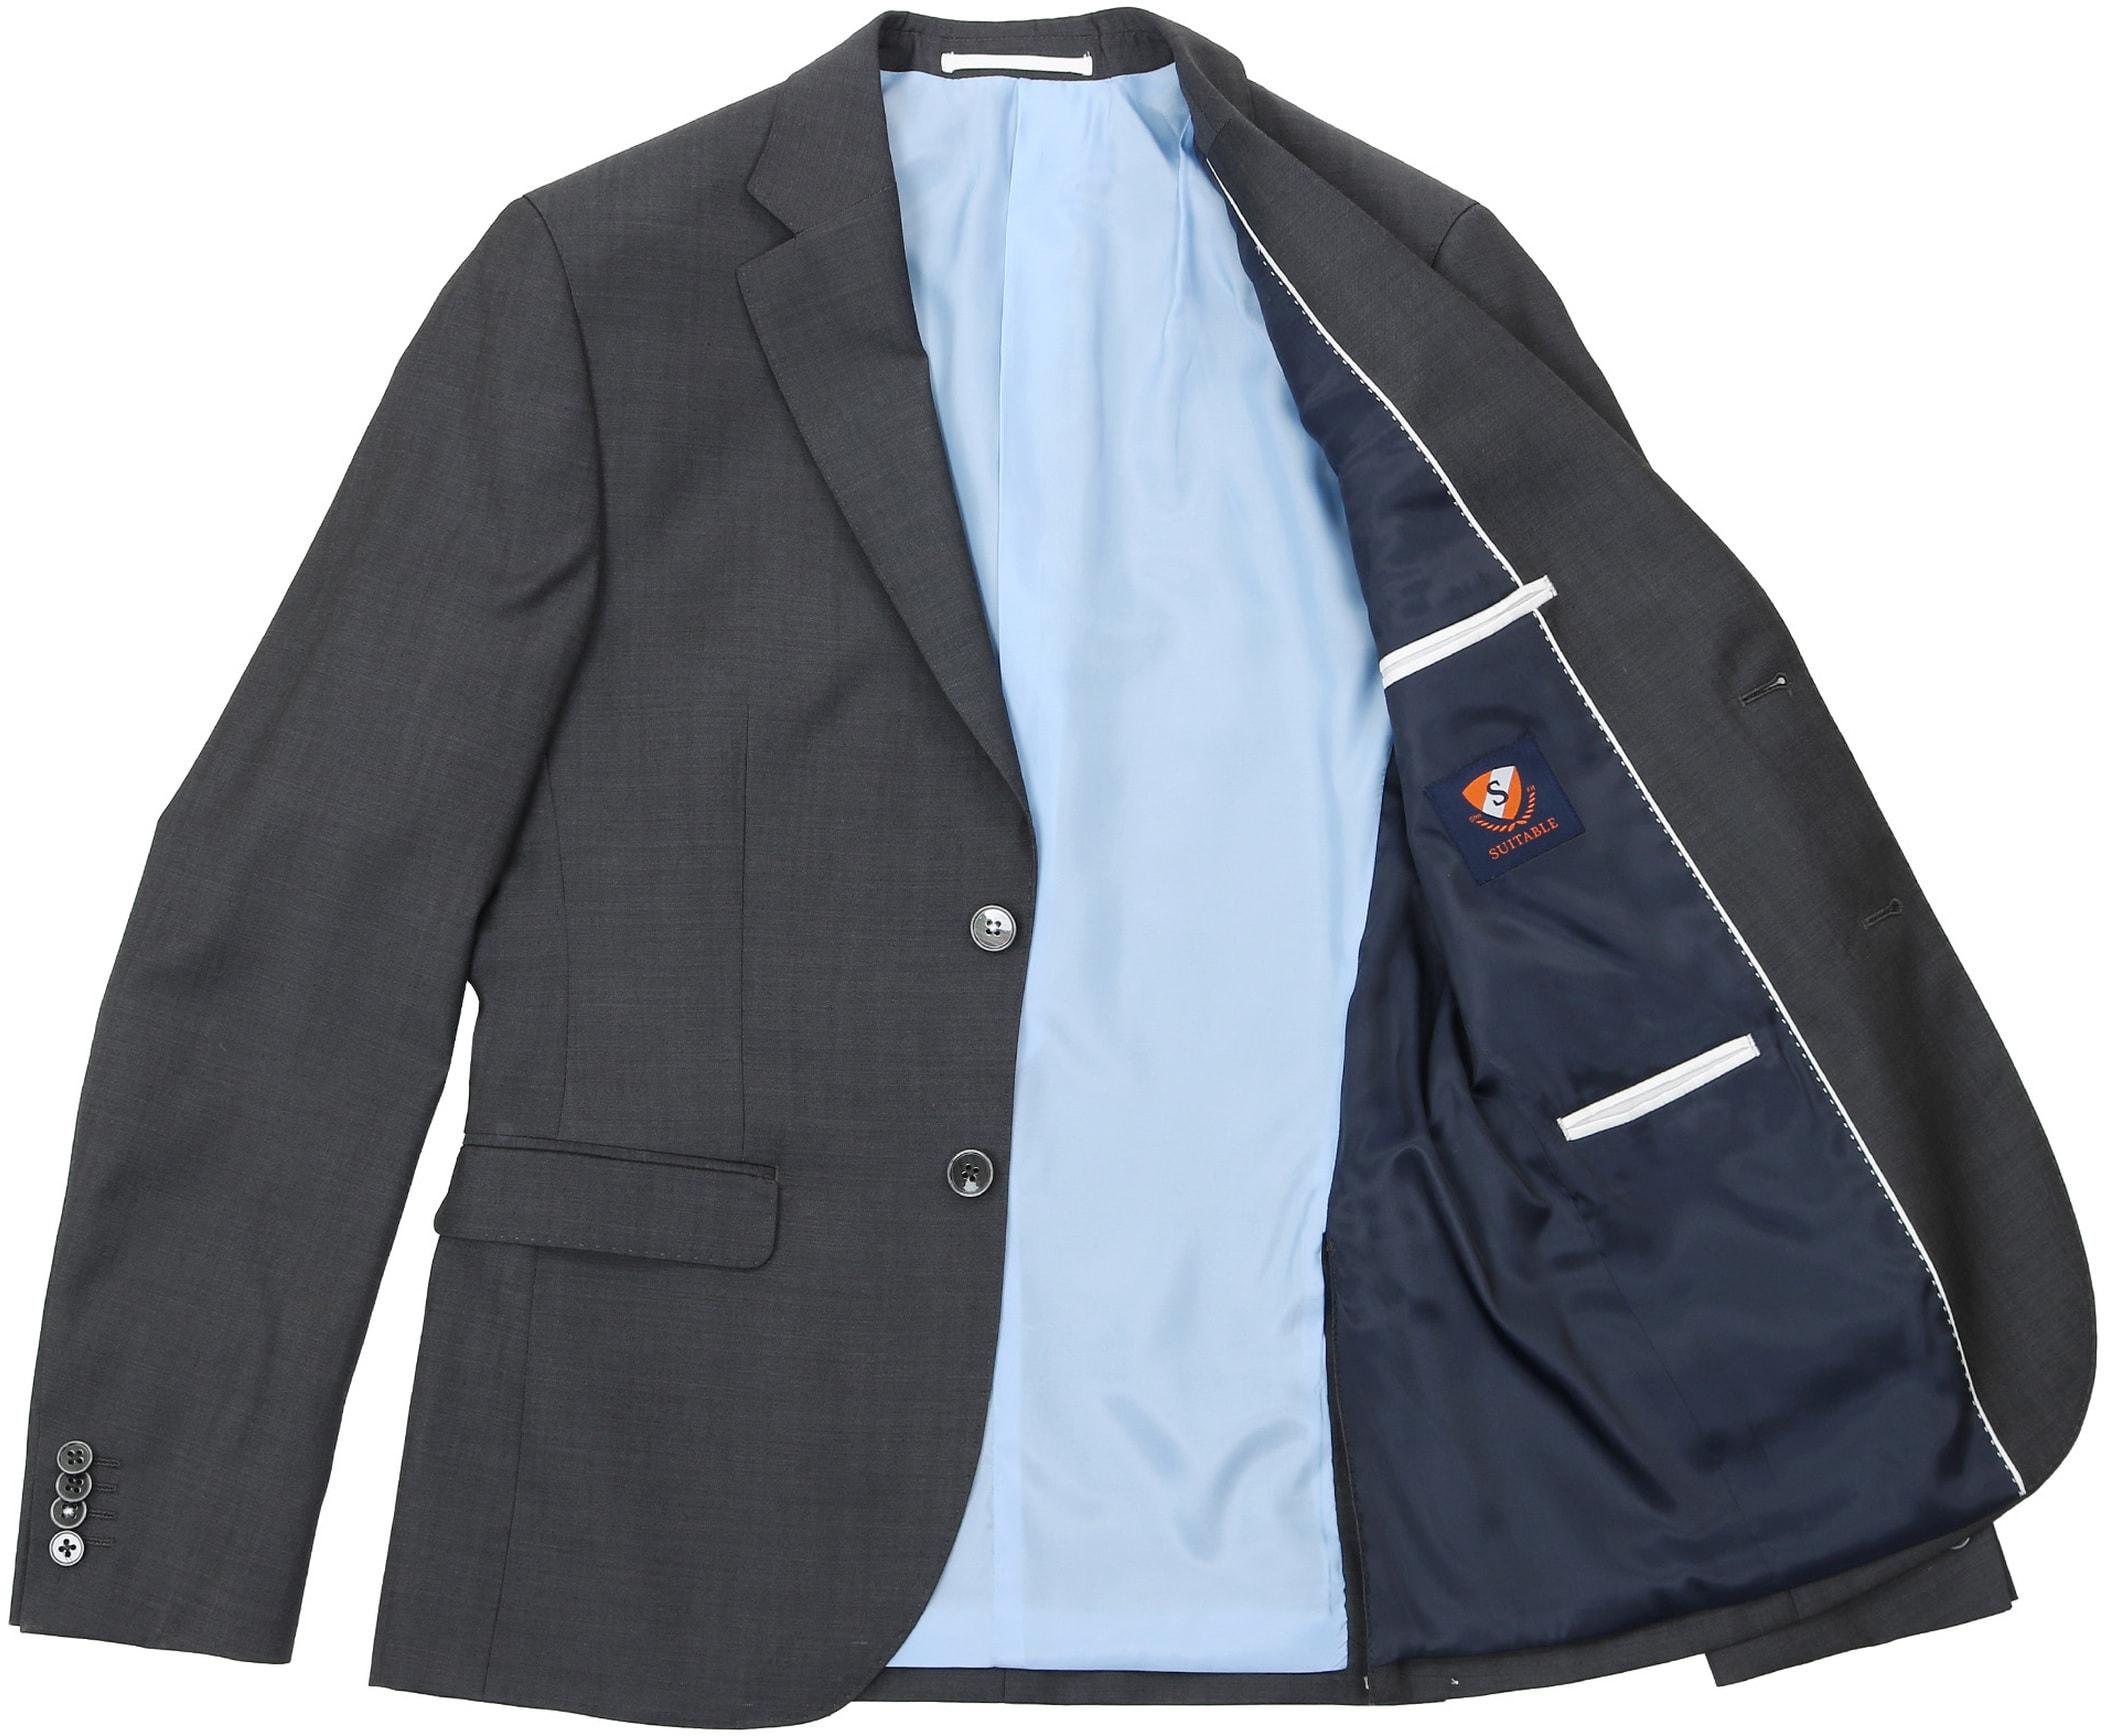 Suitable Anzug Strato Dunkelgrau foto 6